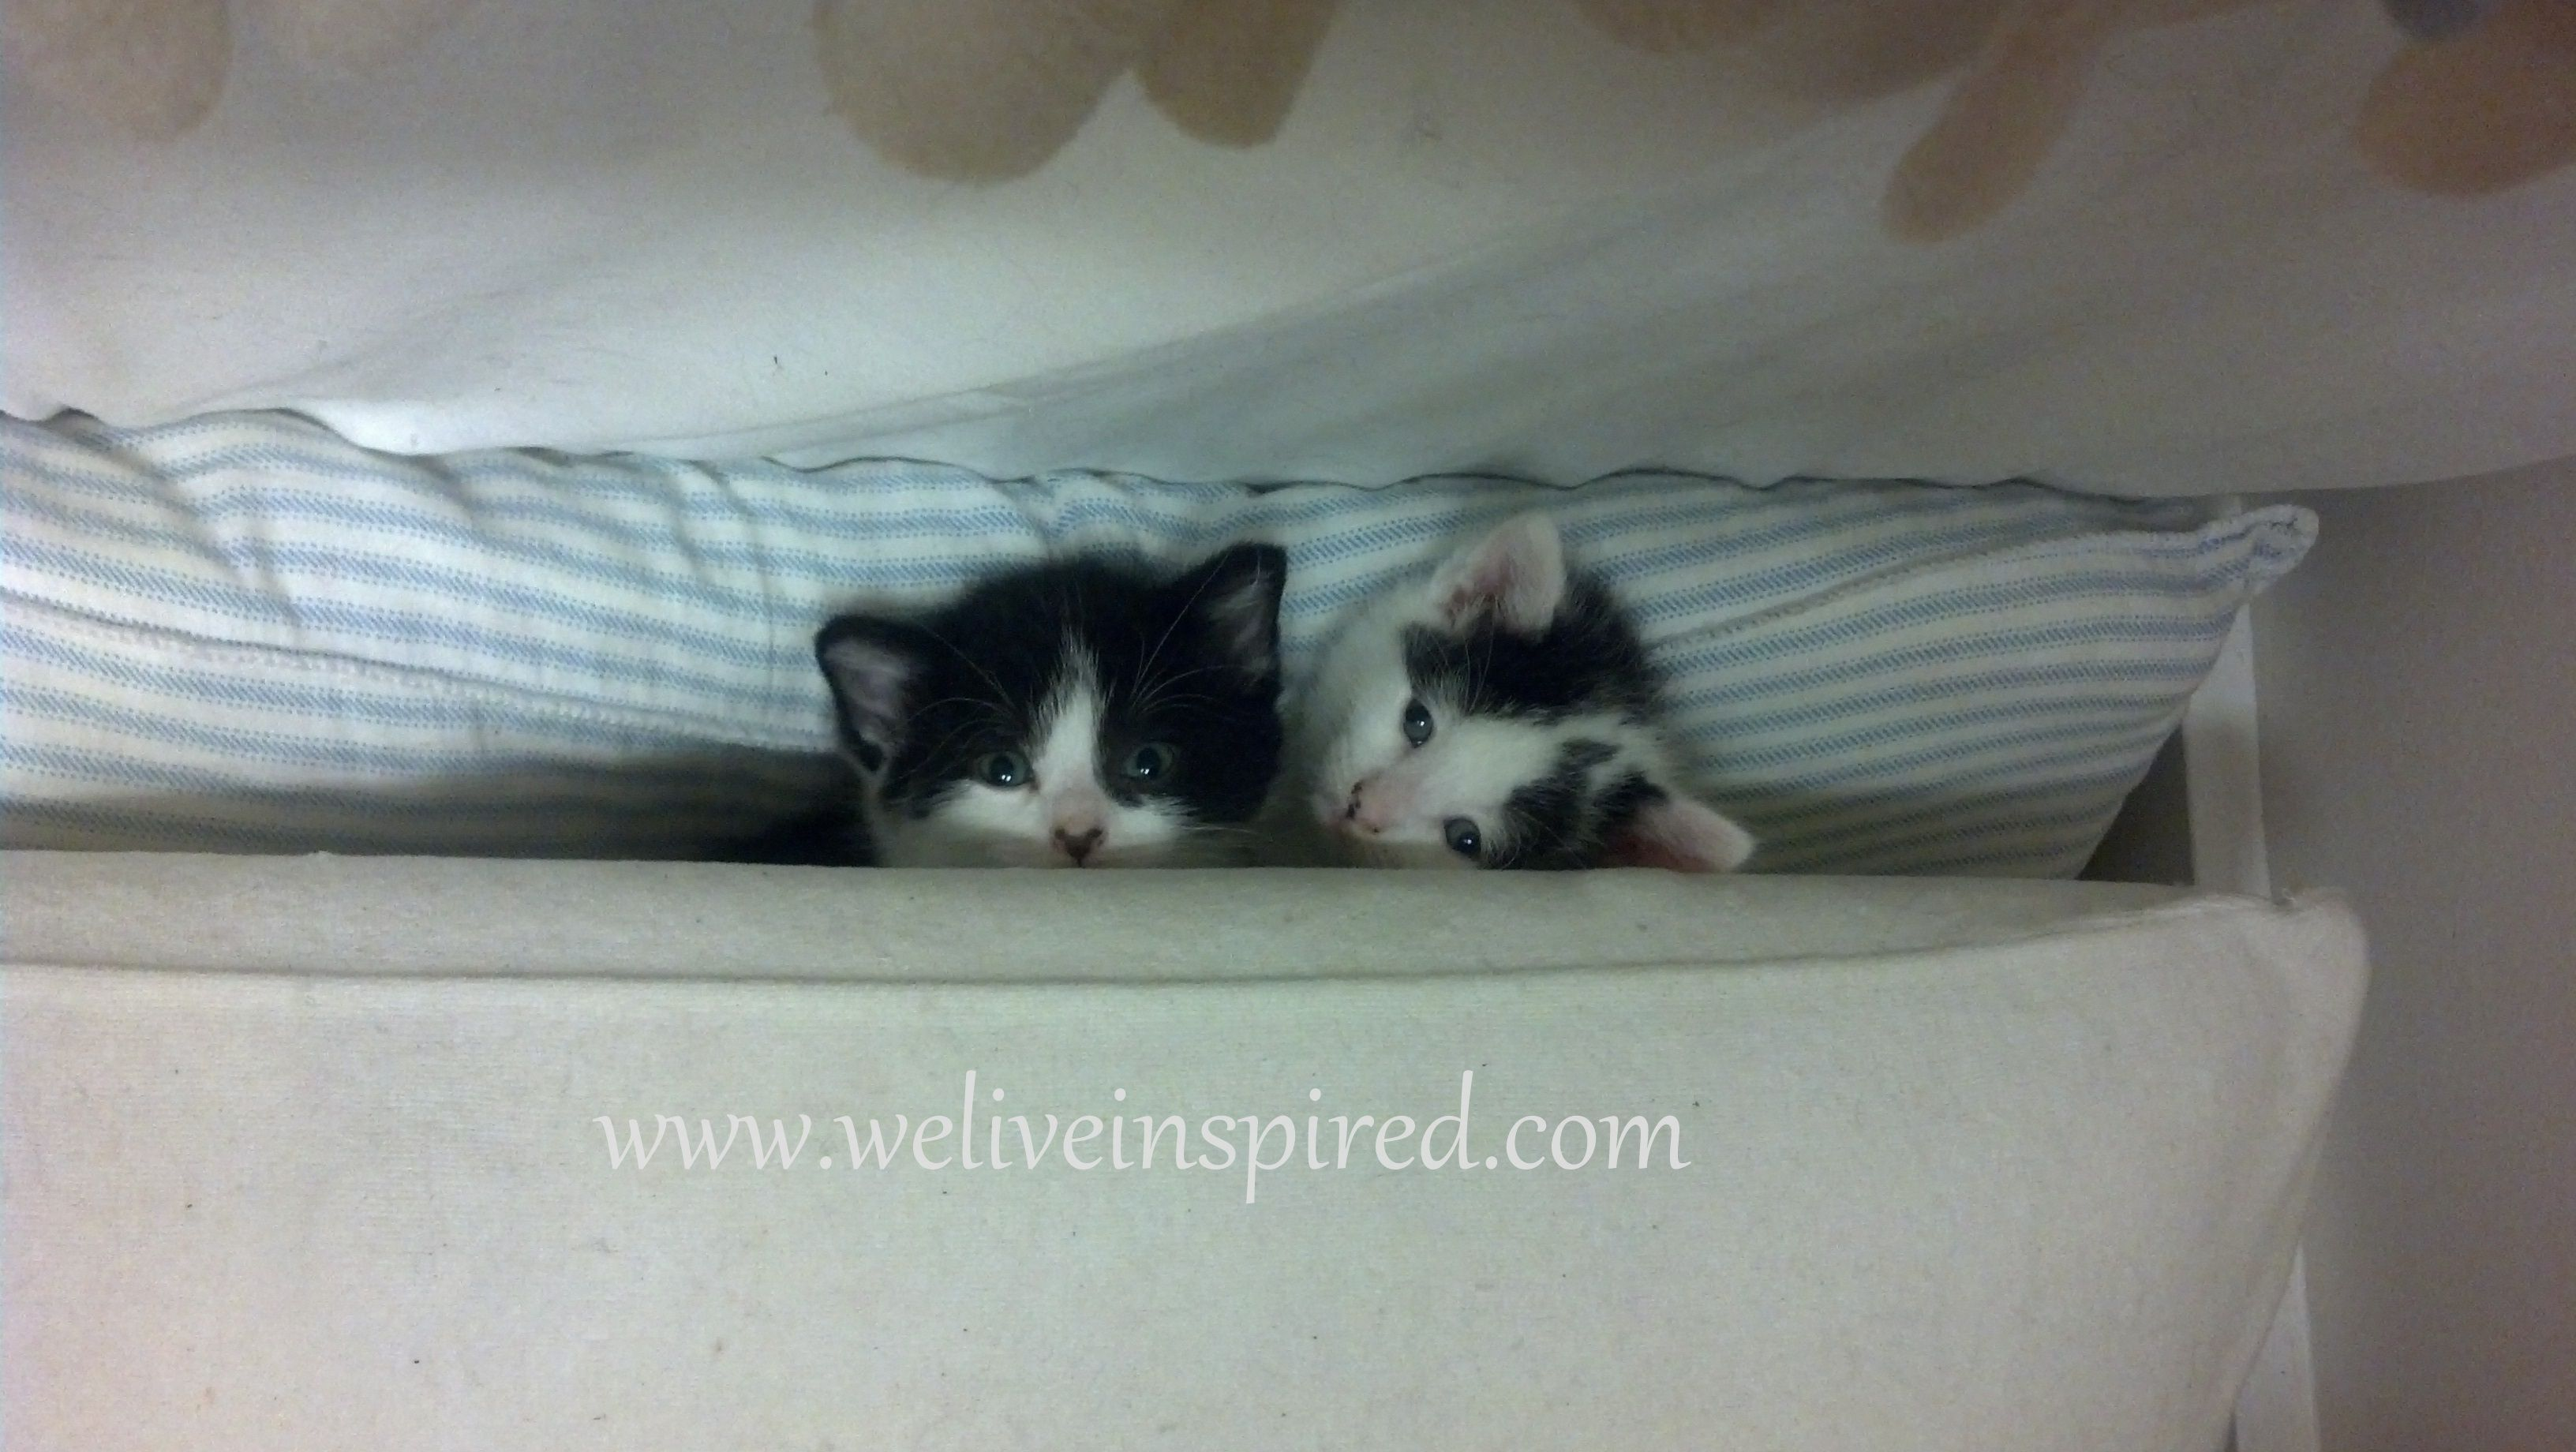 Seeking Comfort We Live Inspired Newborn Kittens 1 Month Olds Kitten Proofing